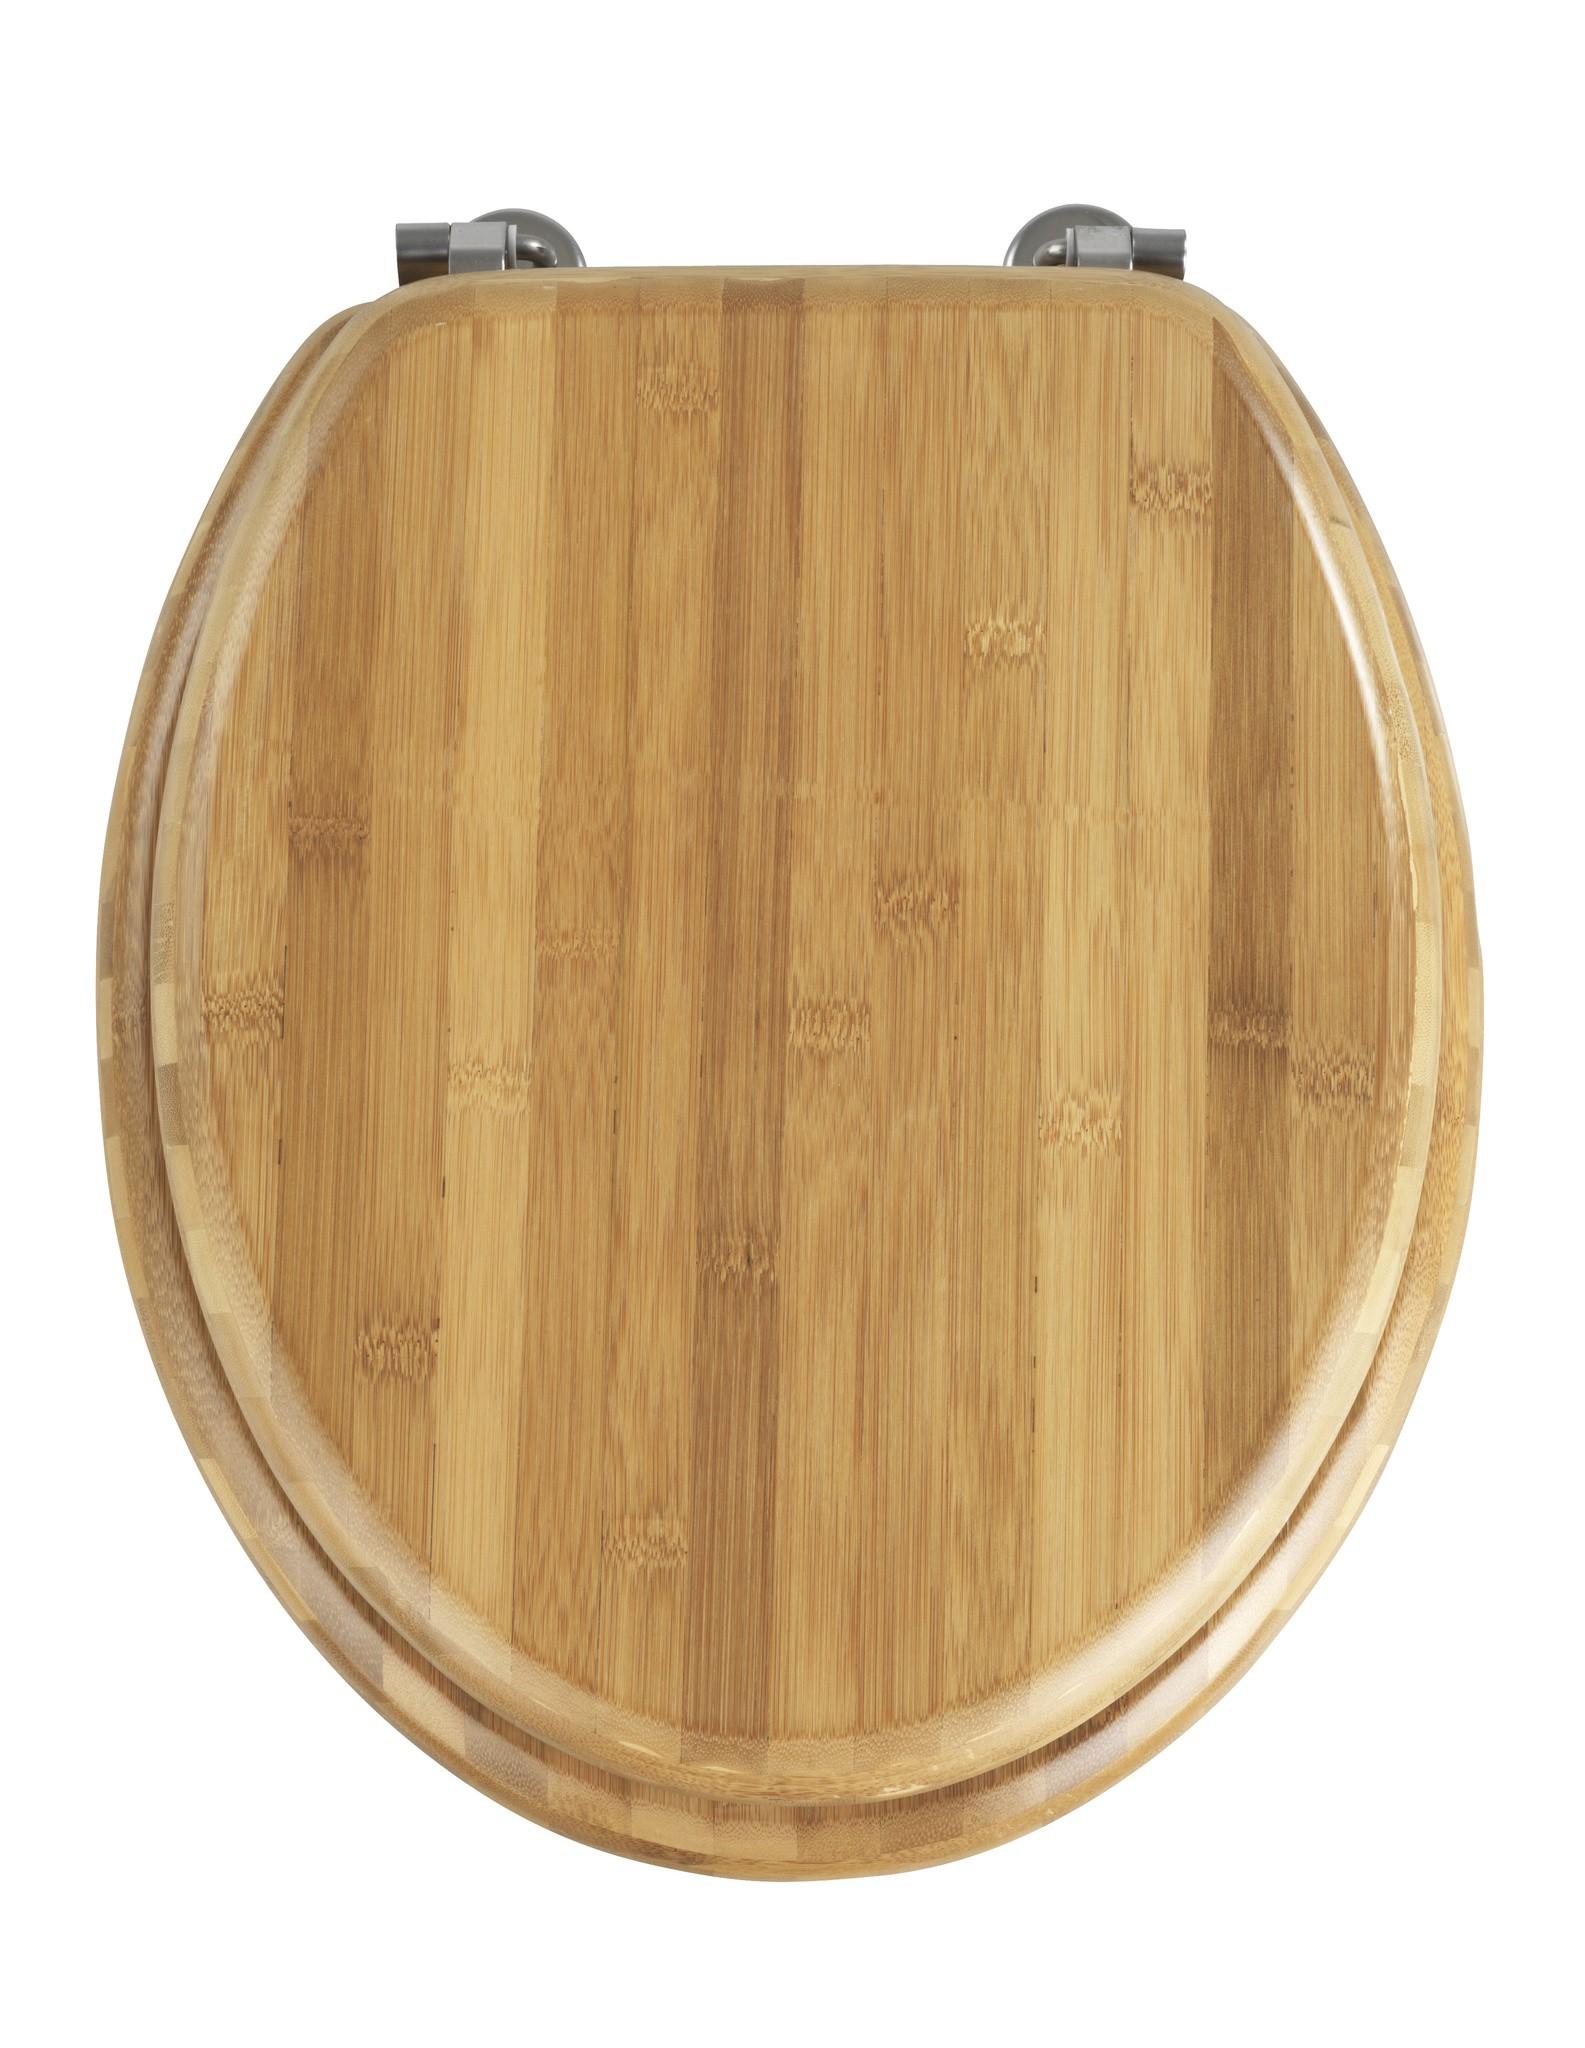 WC-Sitz Bambus Dunkel